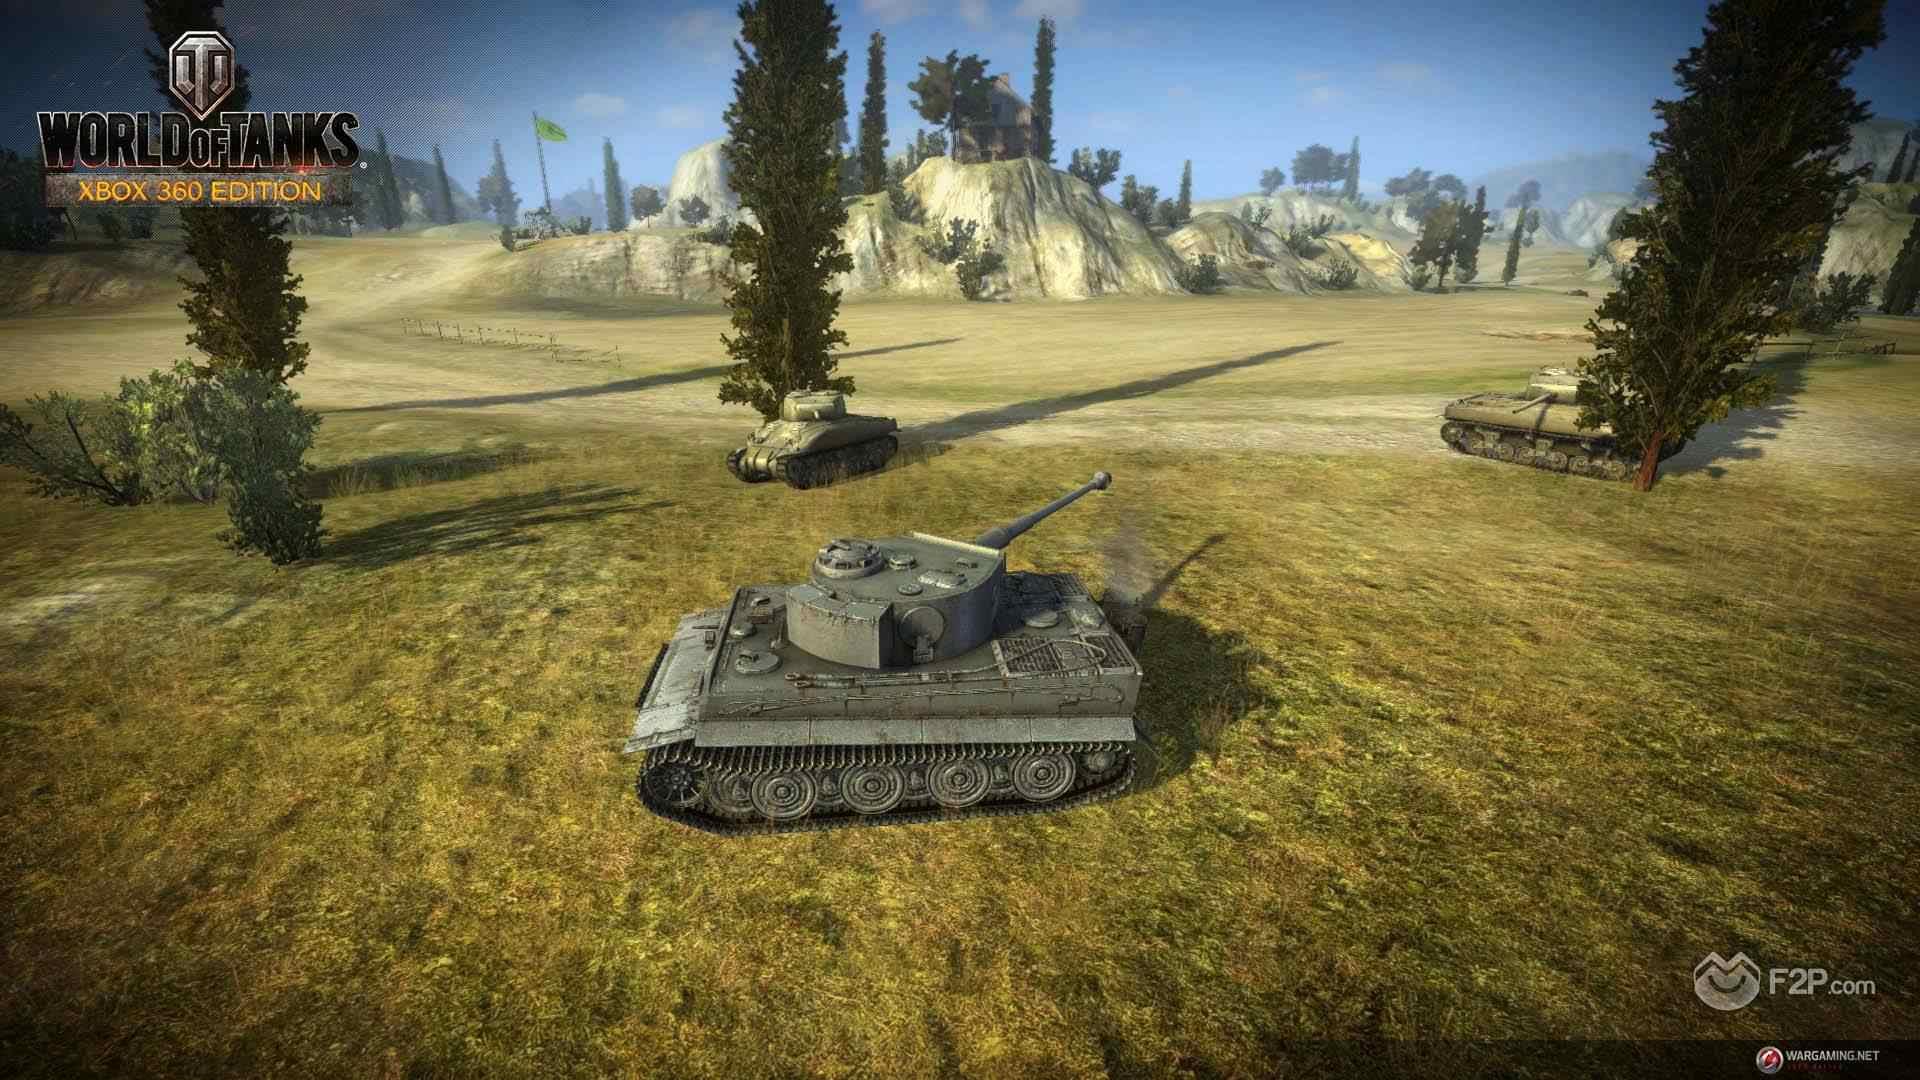 world of tanks xbox 360 buy gold